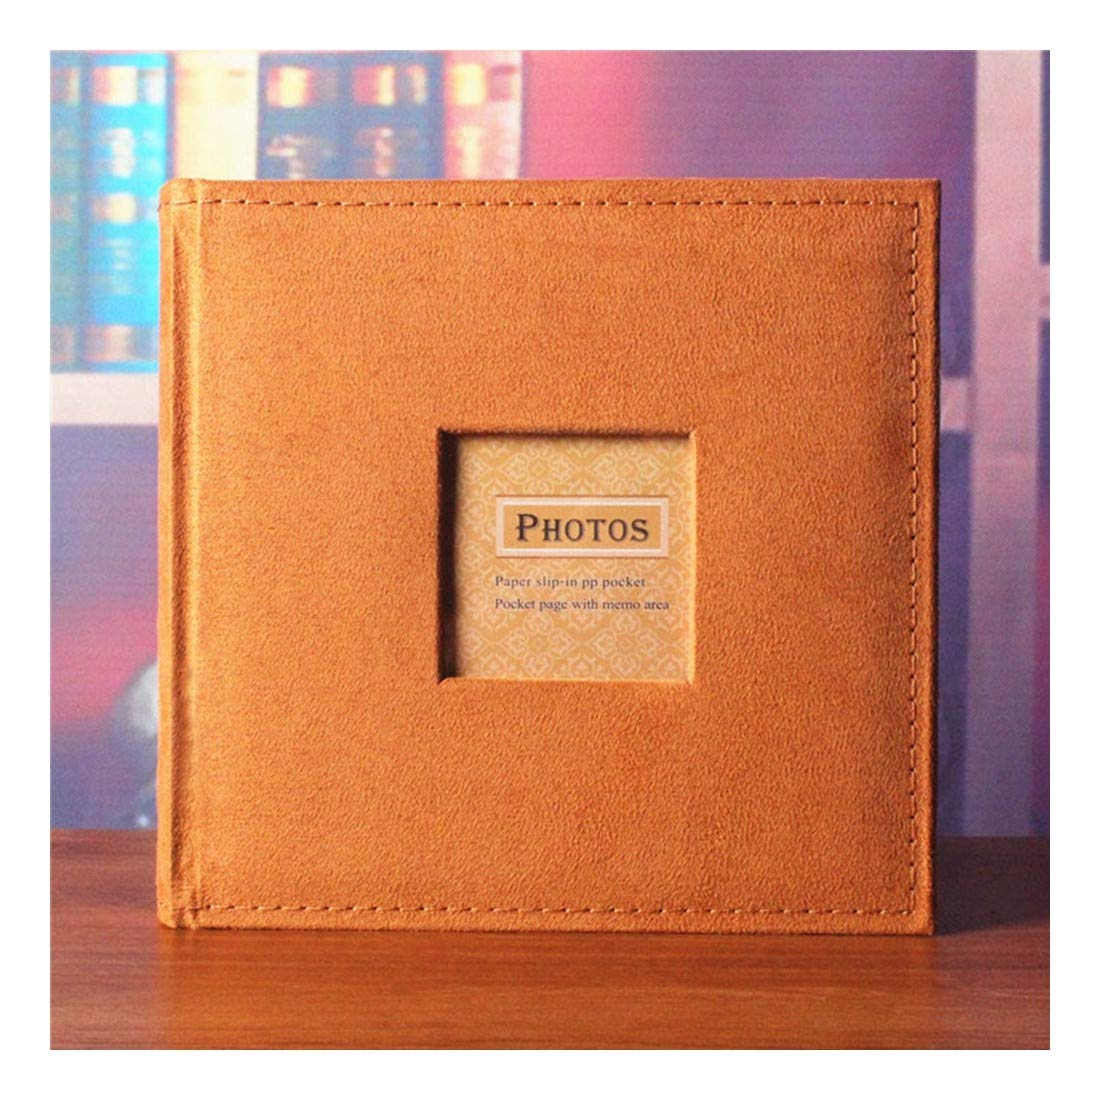 ZHAOXIANGXIANG 6 Pulgadas 200 Photo Album Bolsa Puede Poner 4R 4D 6 Pulgadas Fotos Home Boda Creativa Memoria Álbum De Fotos Familiar Bebé Álbum 3,6 Pulgadas 4D200 Pocket